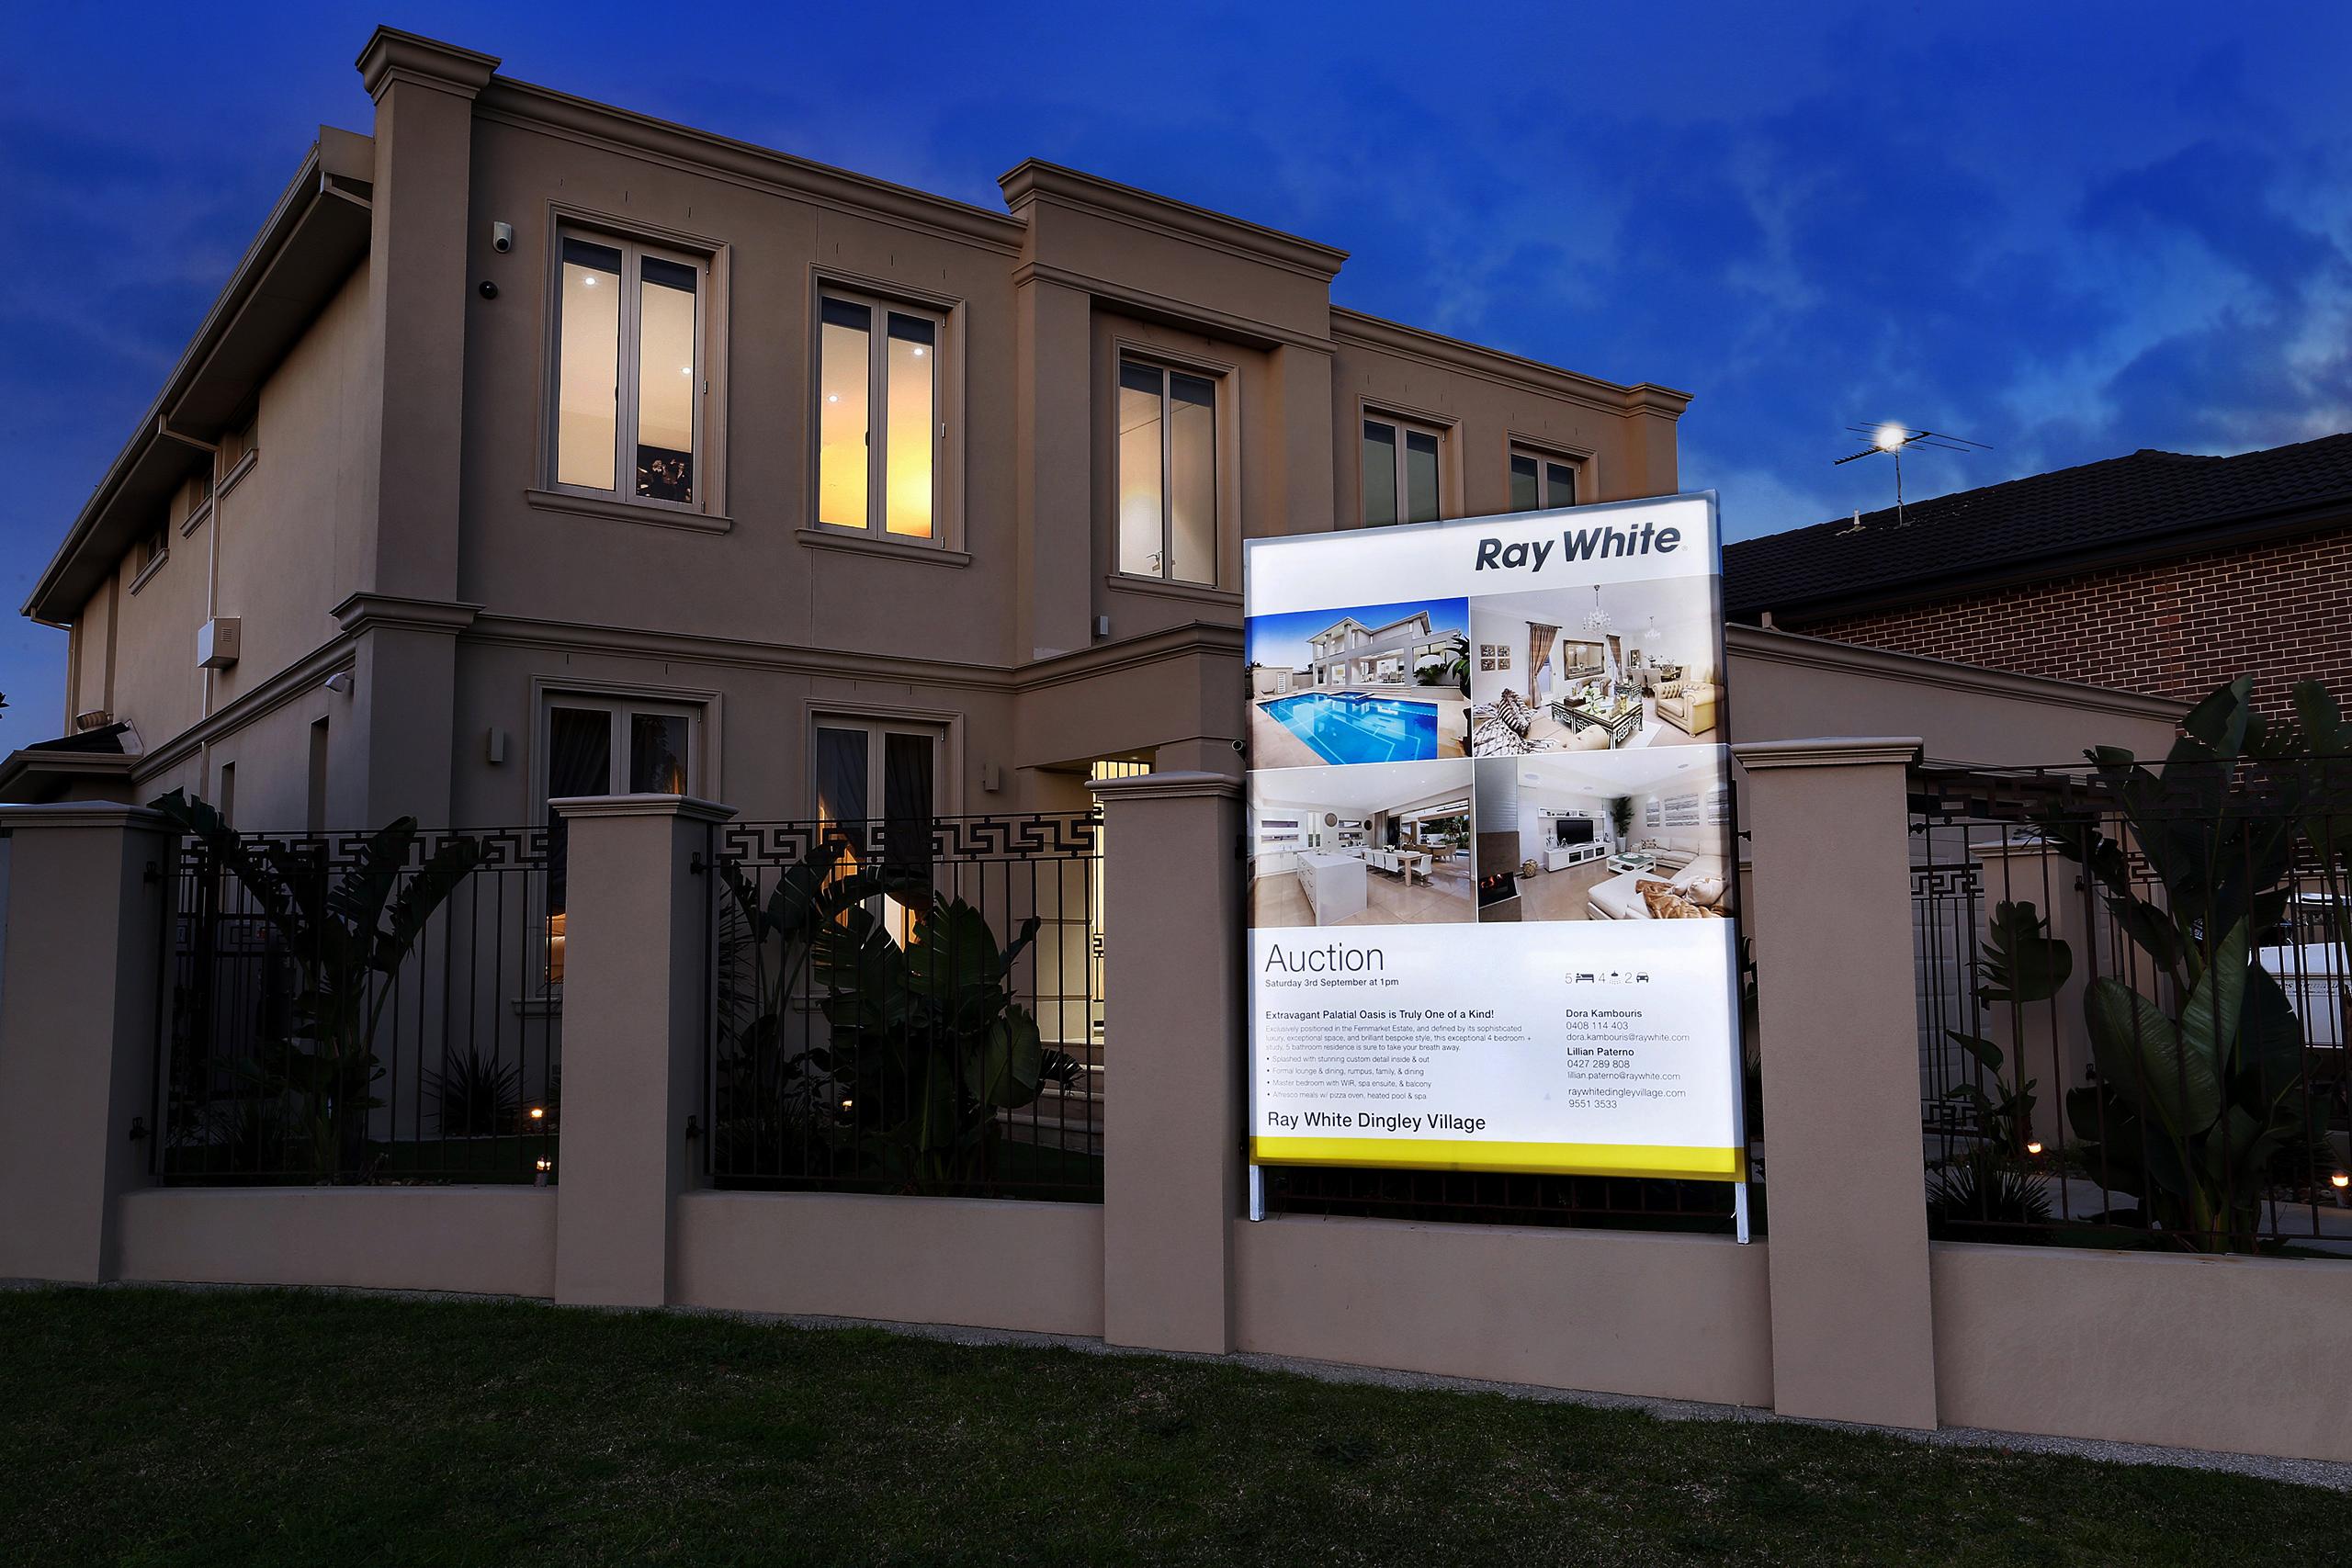 Real Estate Signage Company